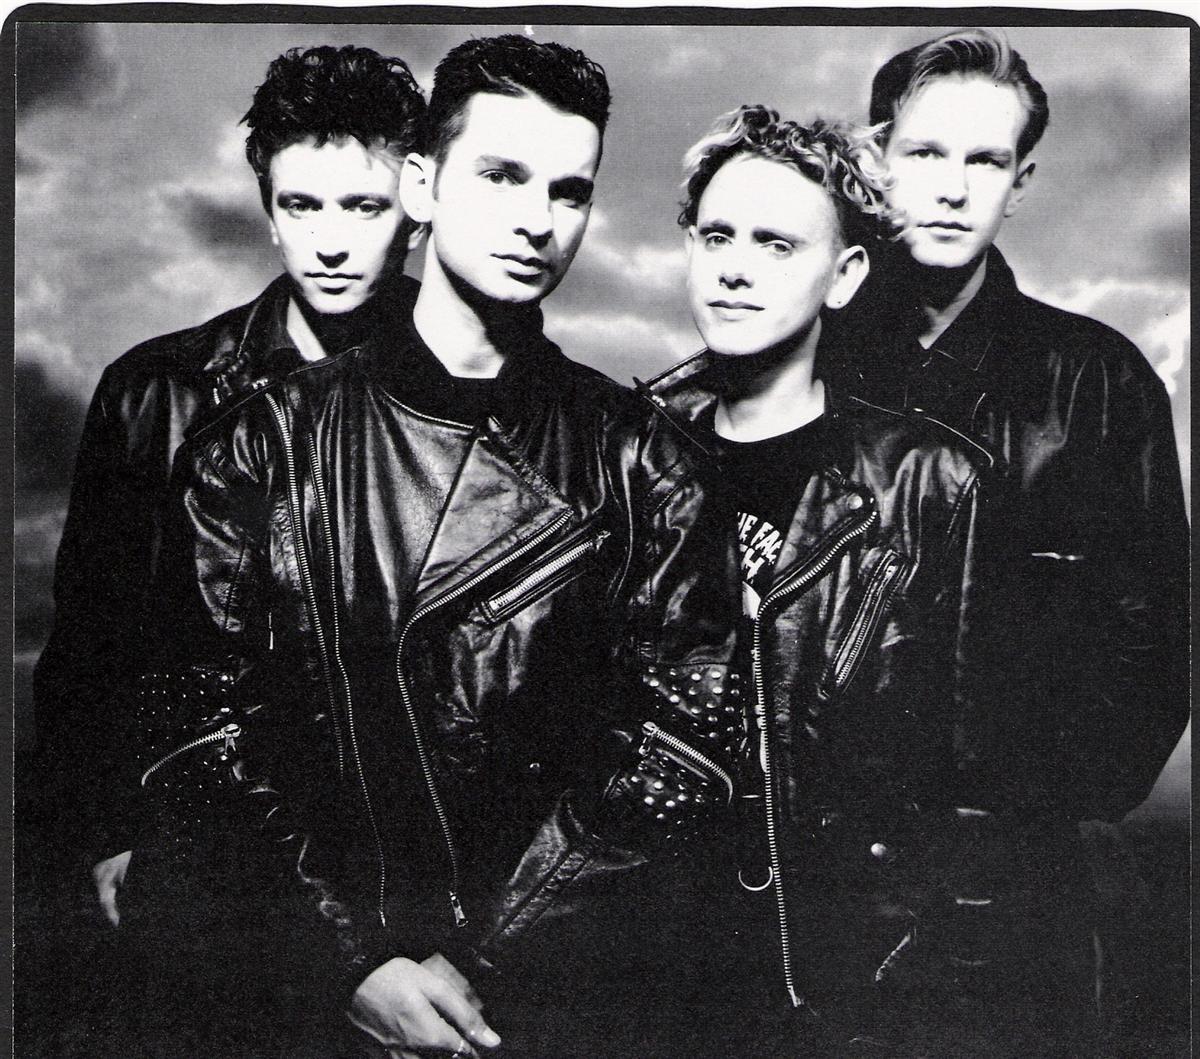 Depeche Mode Photo 227 Of 328 Pics Wallpaper Photo 384911 Theplace2